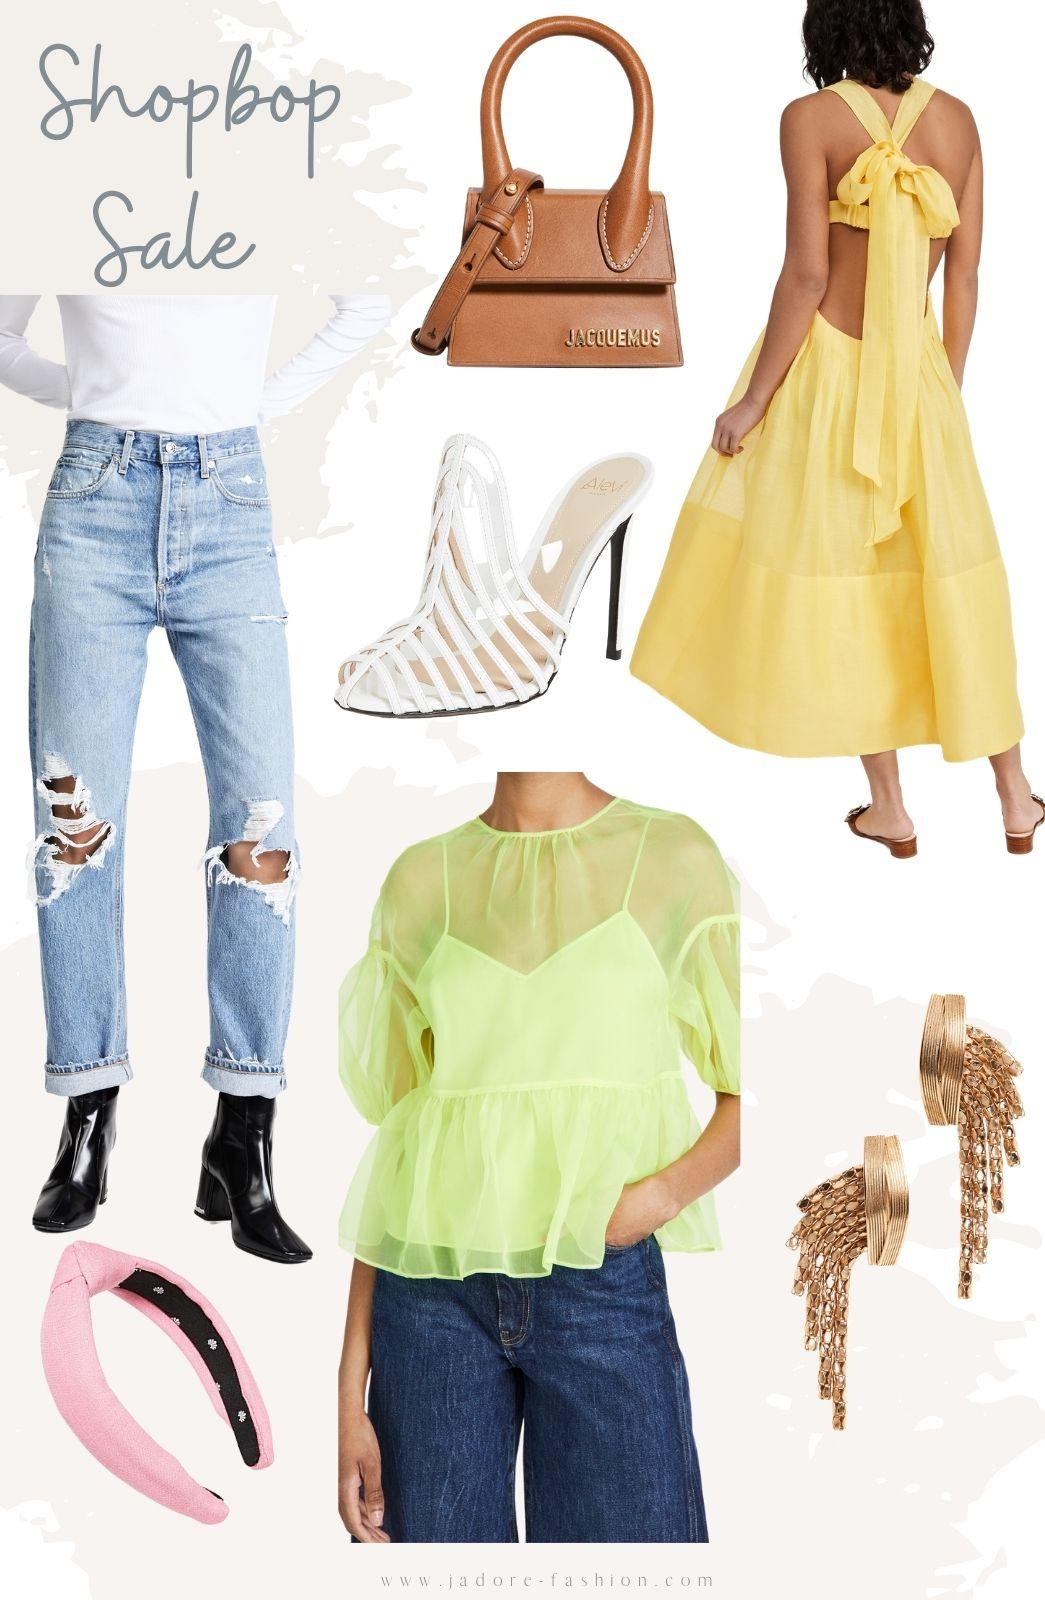 Stella-adewunmi-of-jadore-fashion-blog-share-the-best-of-shopbop-spring-sale